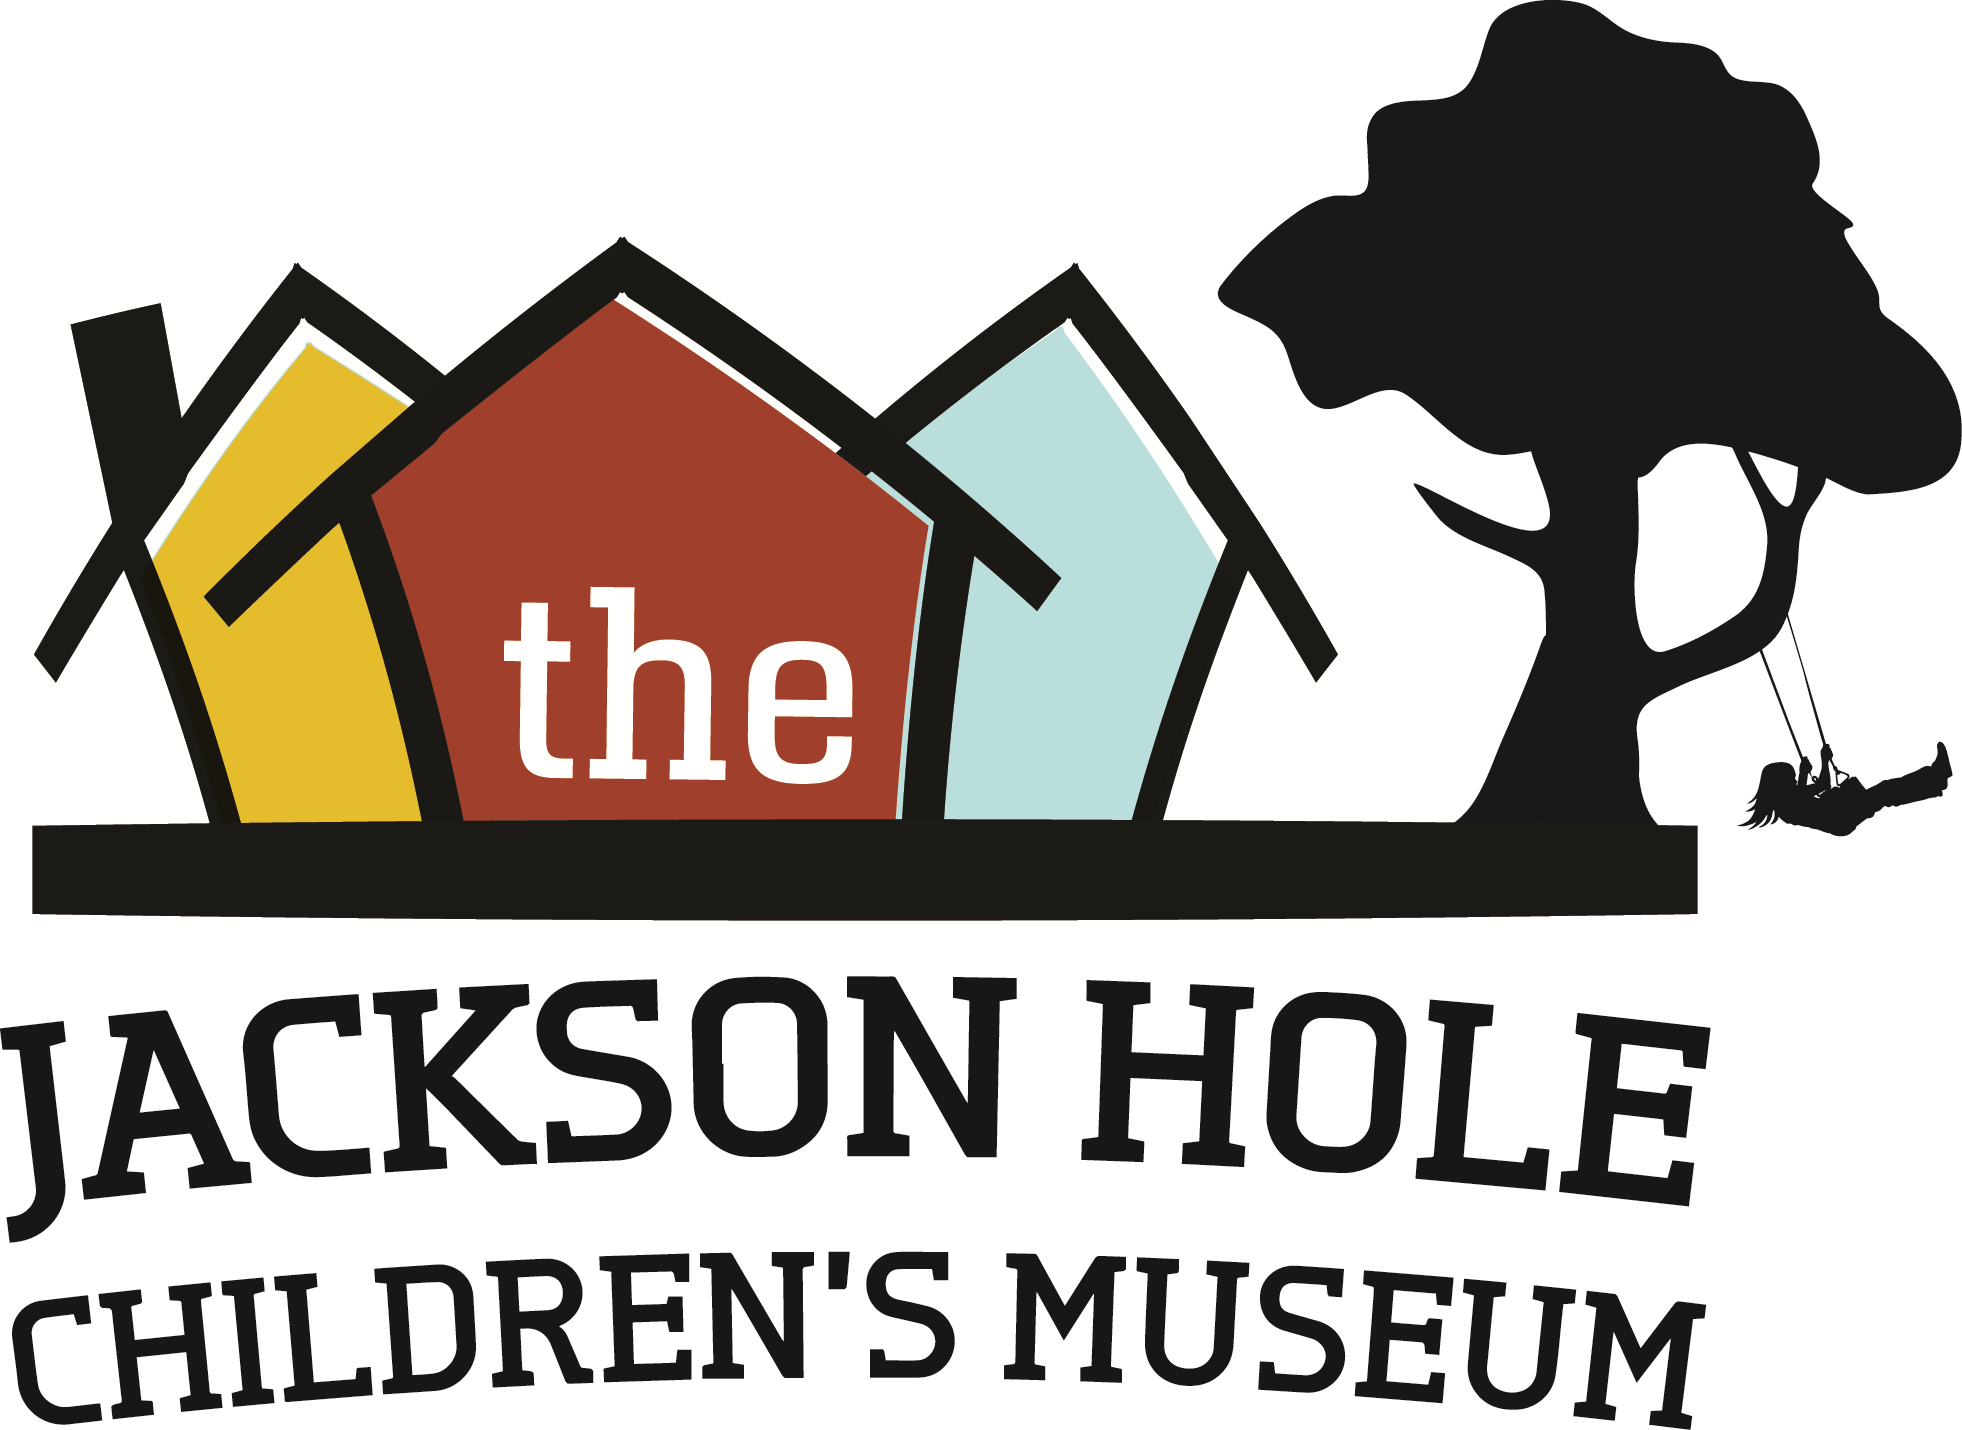 The Jackson Hole Children's Museum logo